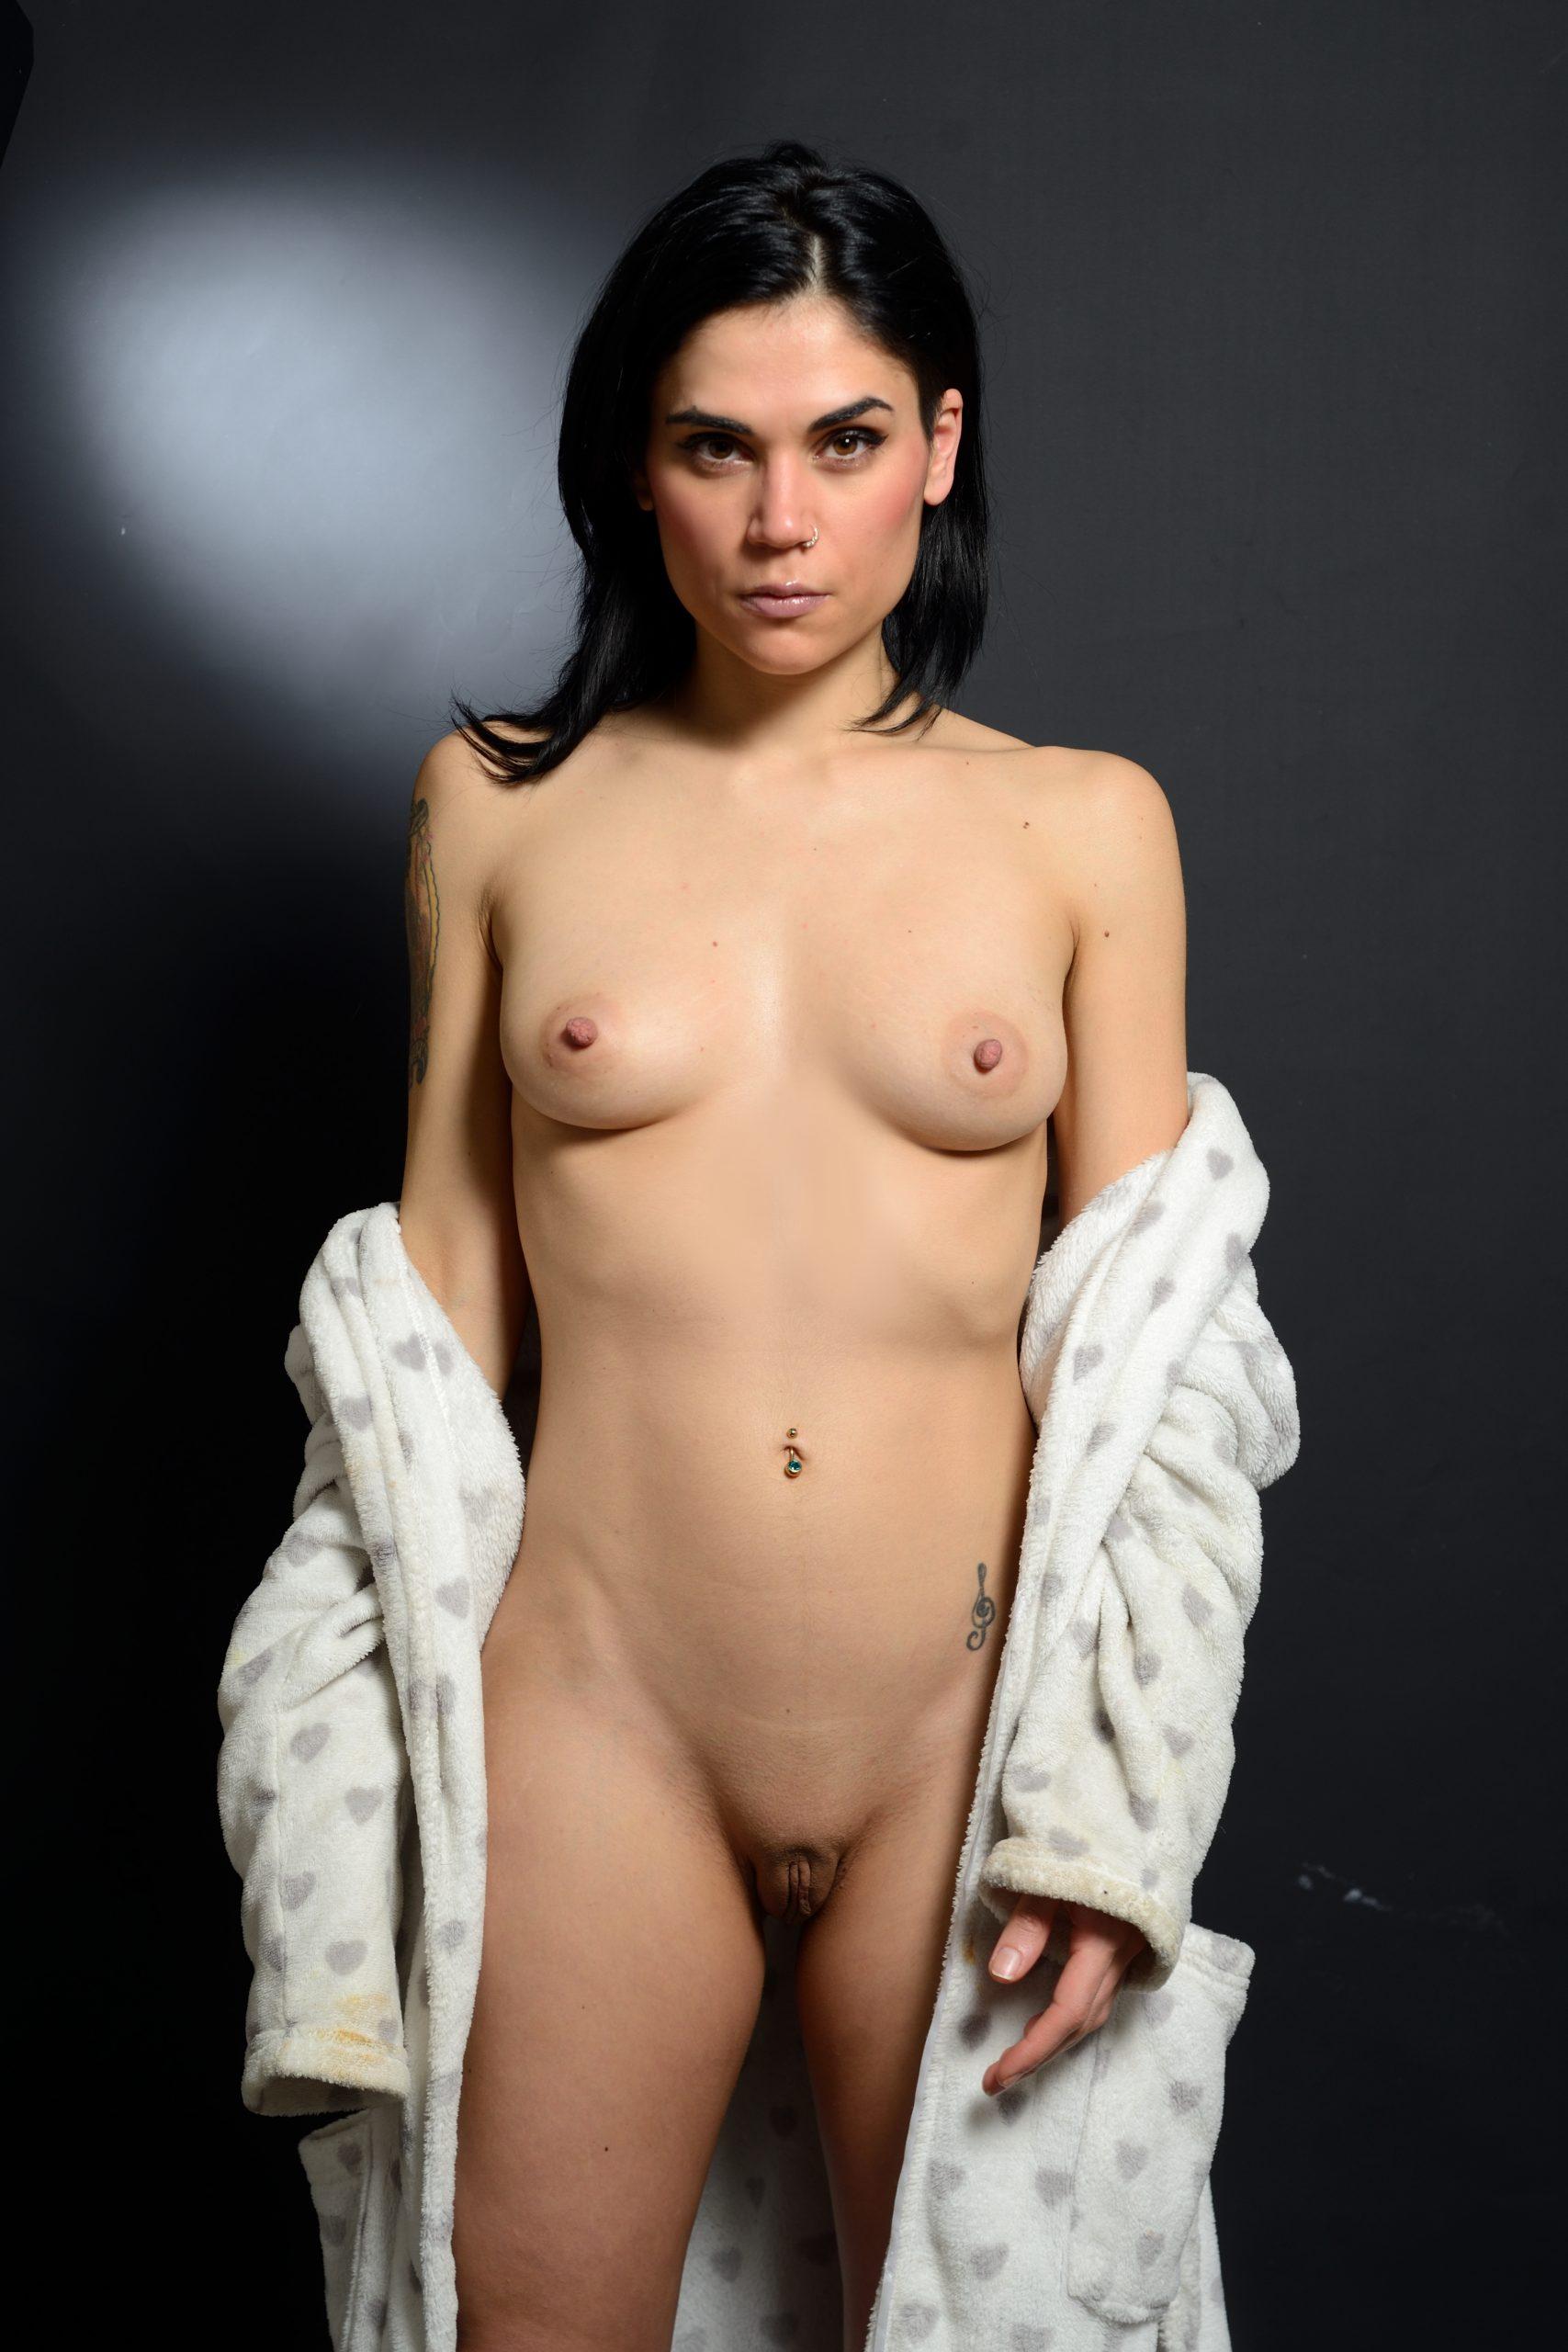 chiara manese nude